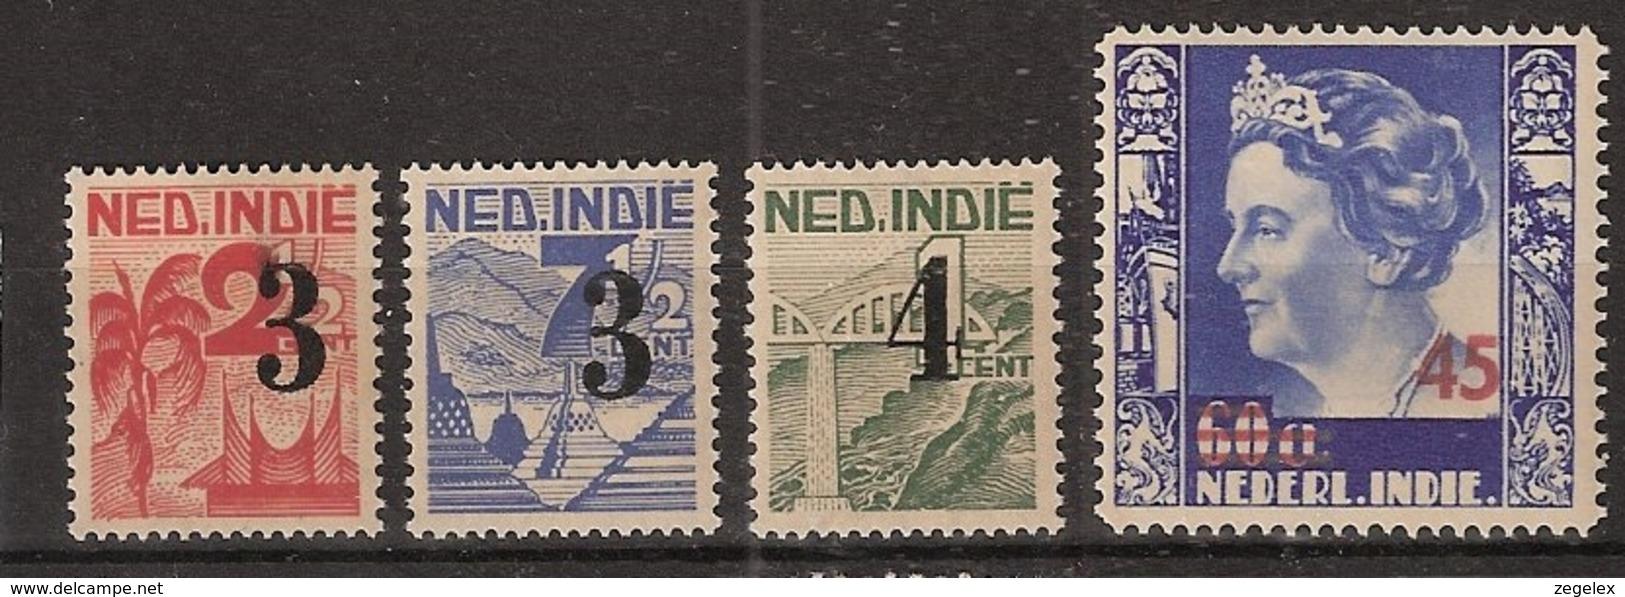 Ned Indie 1947 Hulpuitgifte NVPH 322-325 Postfrisch/MNH/** - Nederlands-Indië